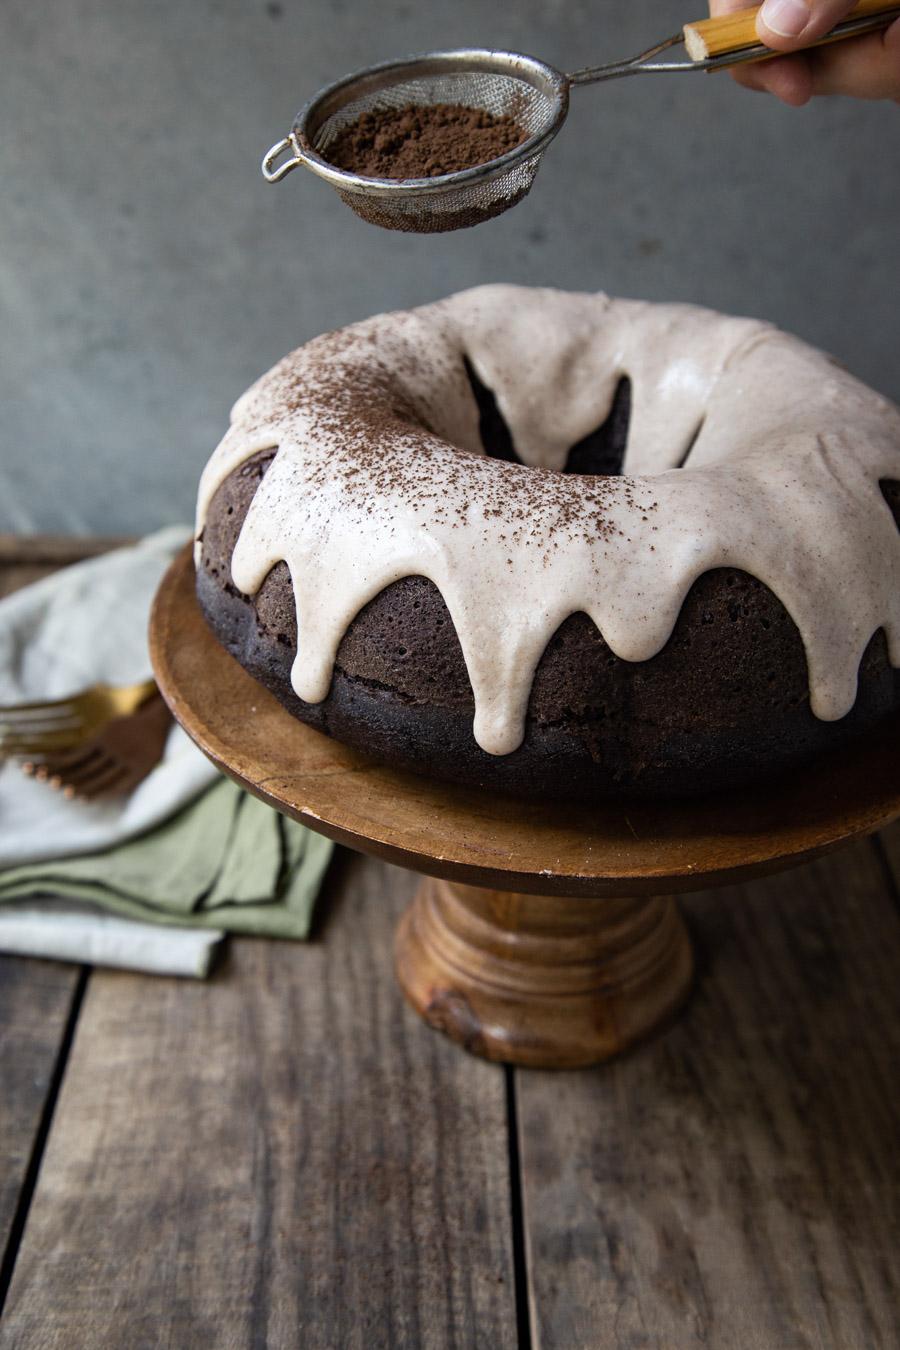 Mexican Chocolate Cake with Cinnamon Glaze